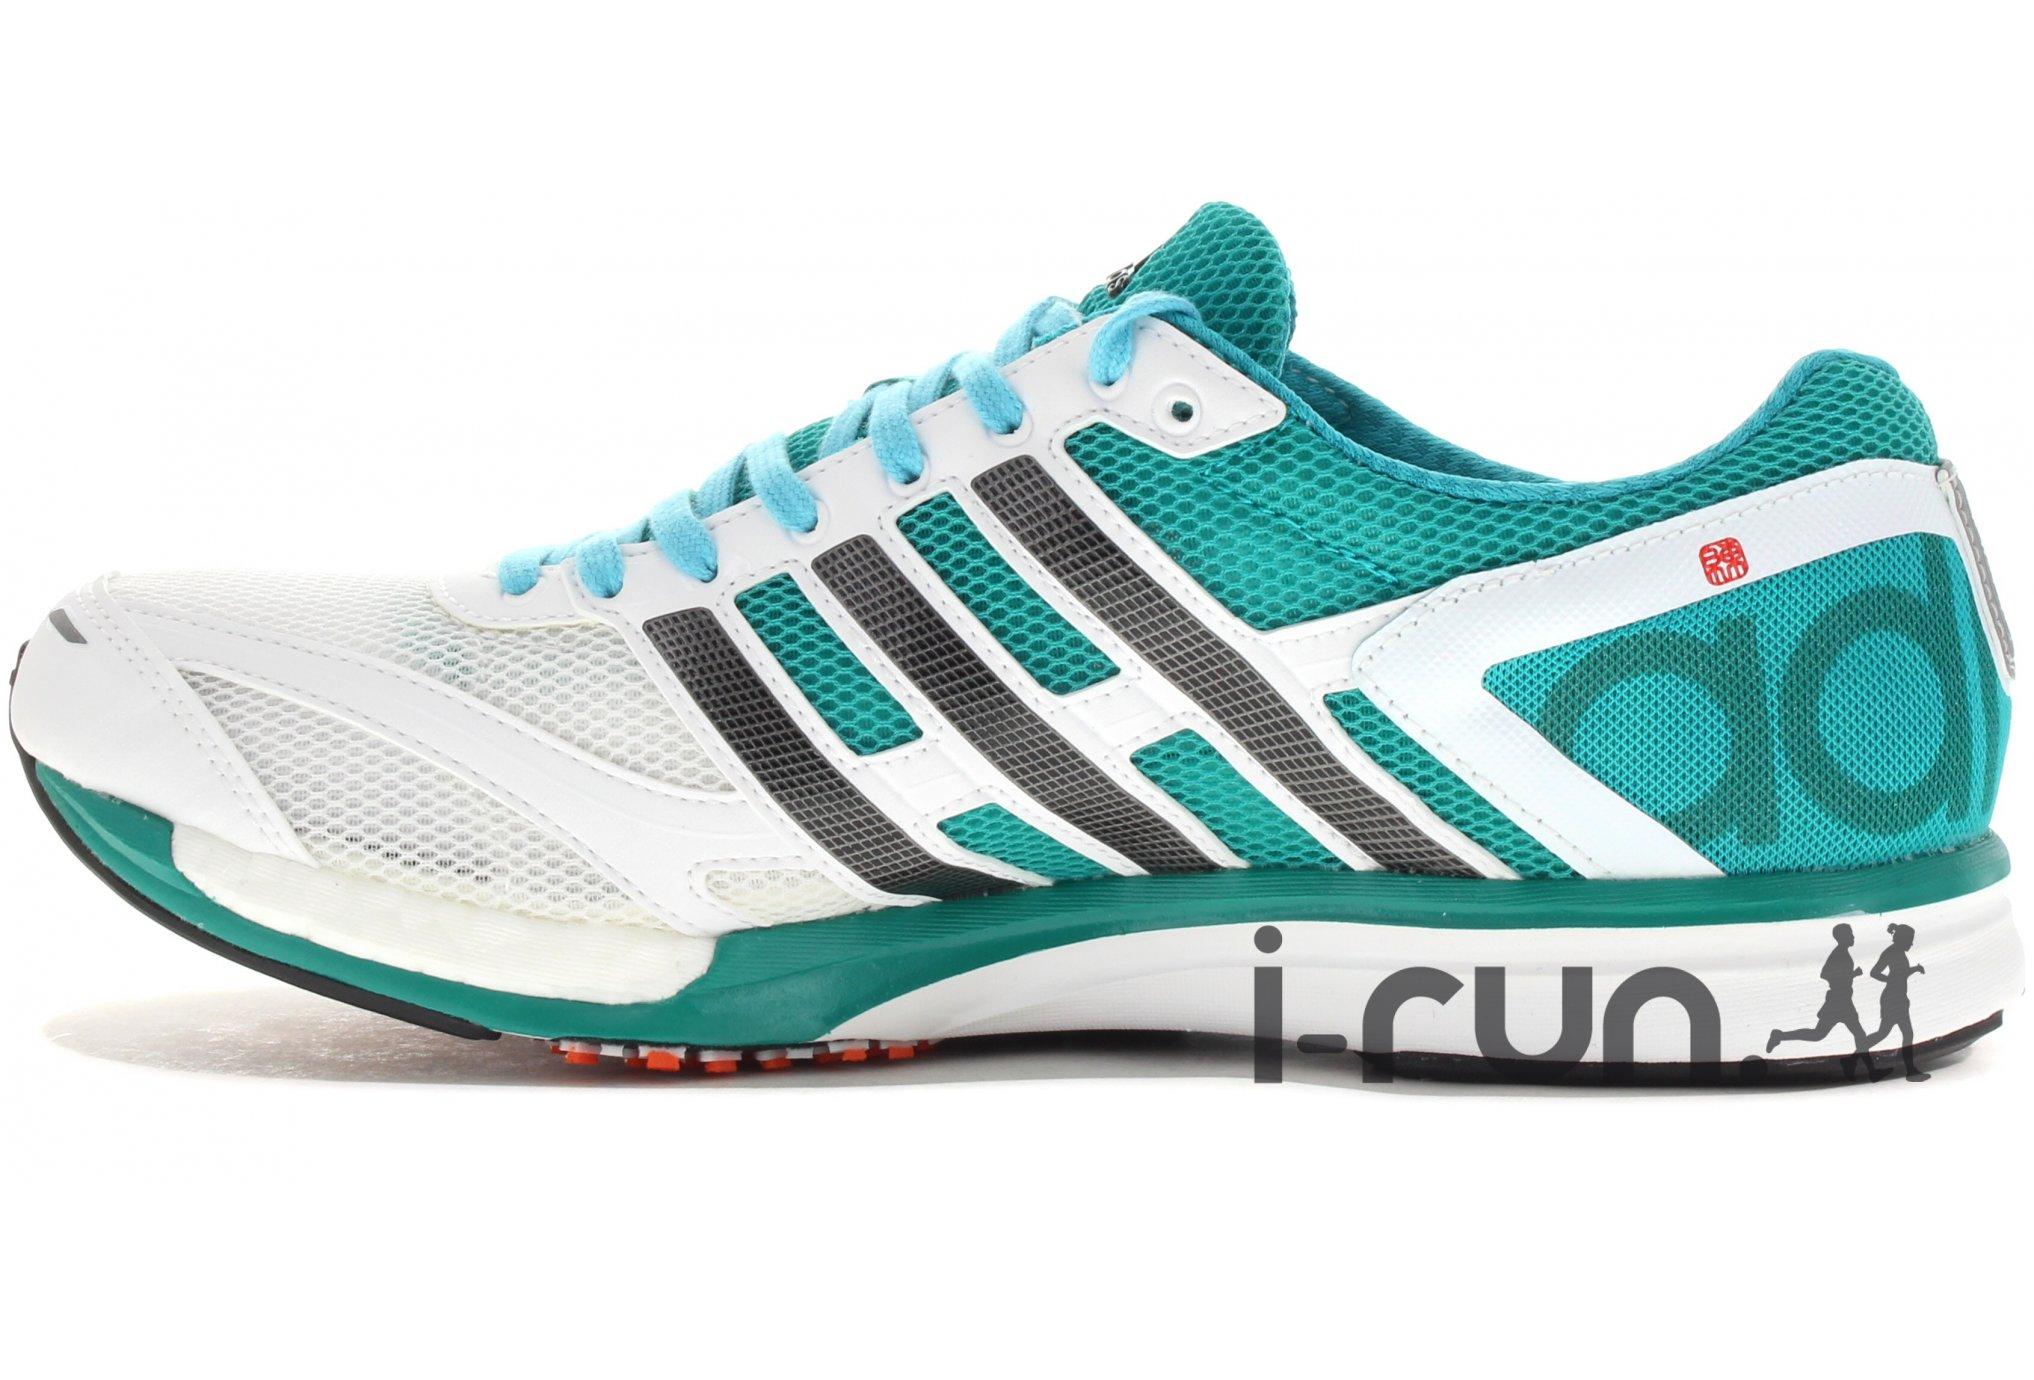 online store fe21c 7da3d ... adidas adizero takumi ren boost 3 m chaussures homme 117965 1 sz